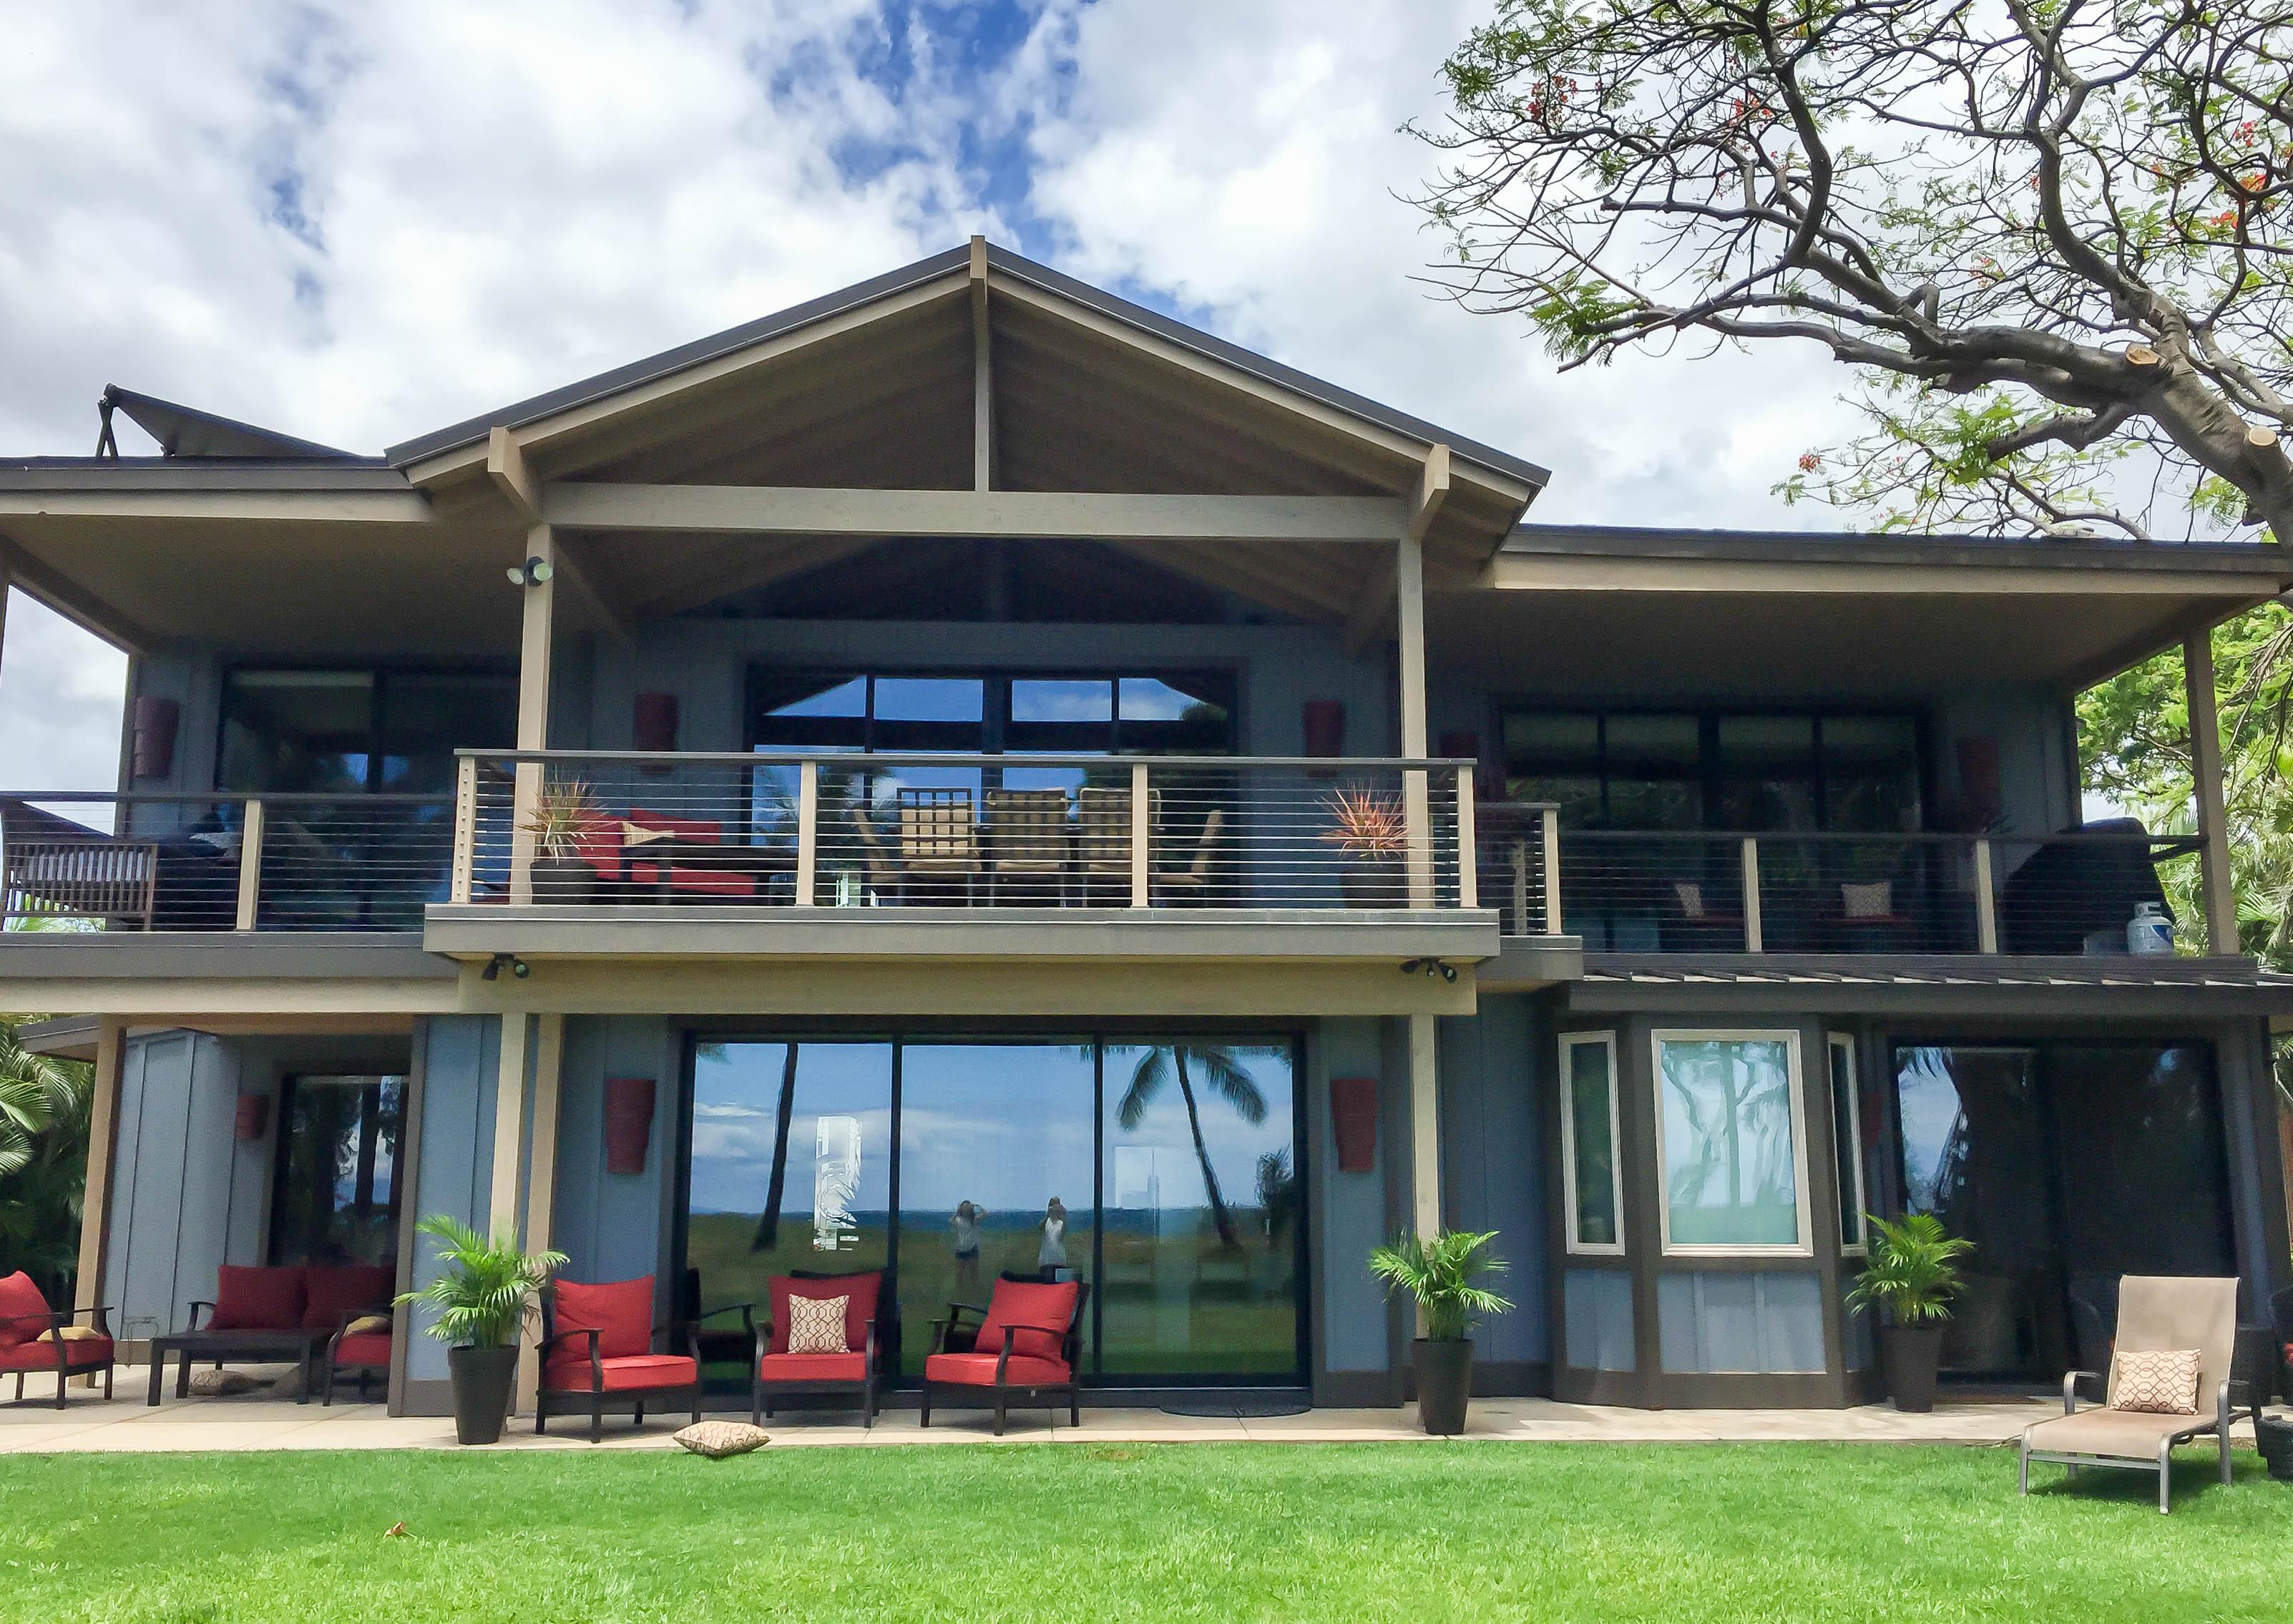 Villa Moana Maui in Kihei Maui